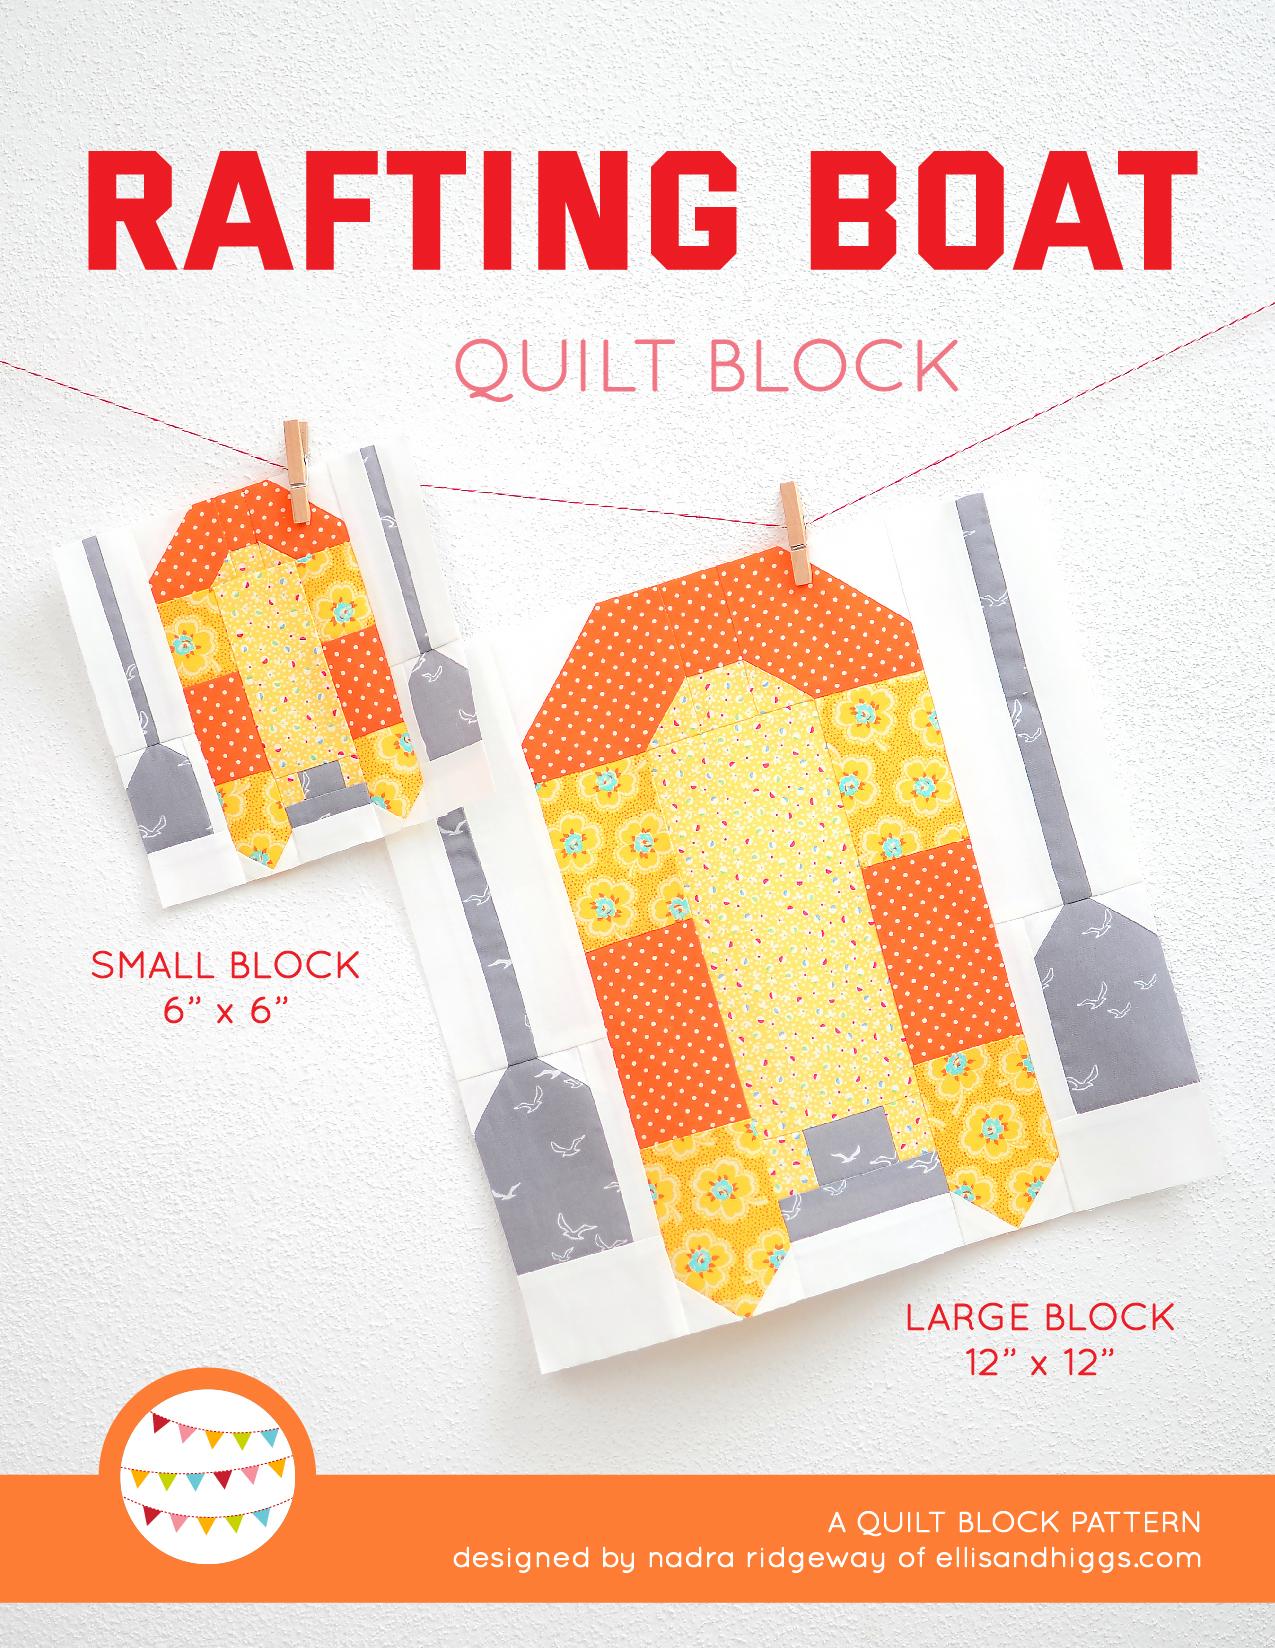 Summer quilt patterns - Rafting Boat quilt pattern